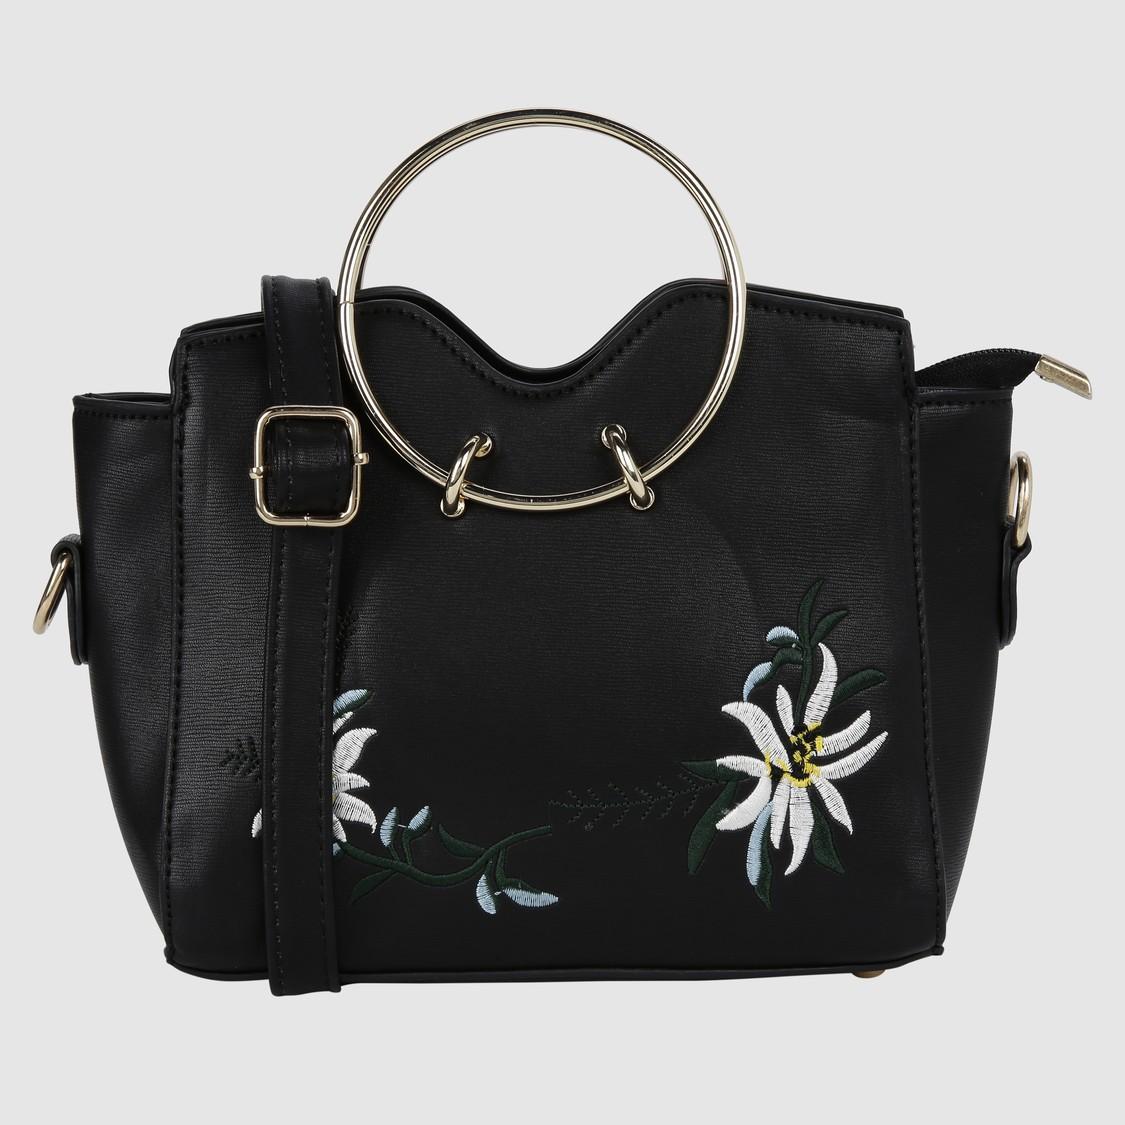 Embroidered Handbag with Zip Closure